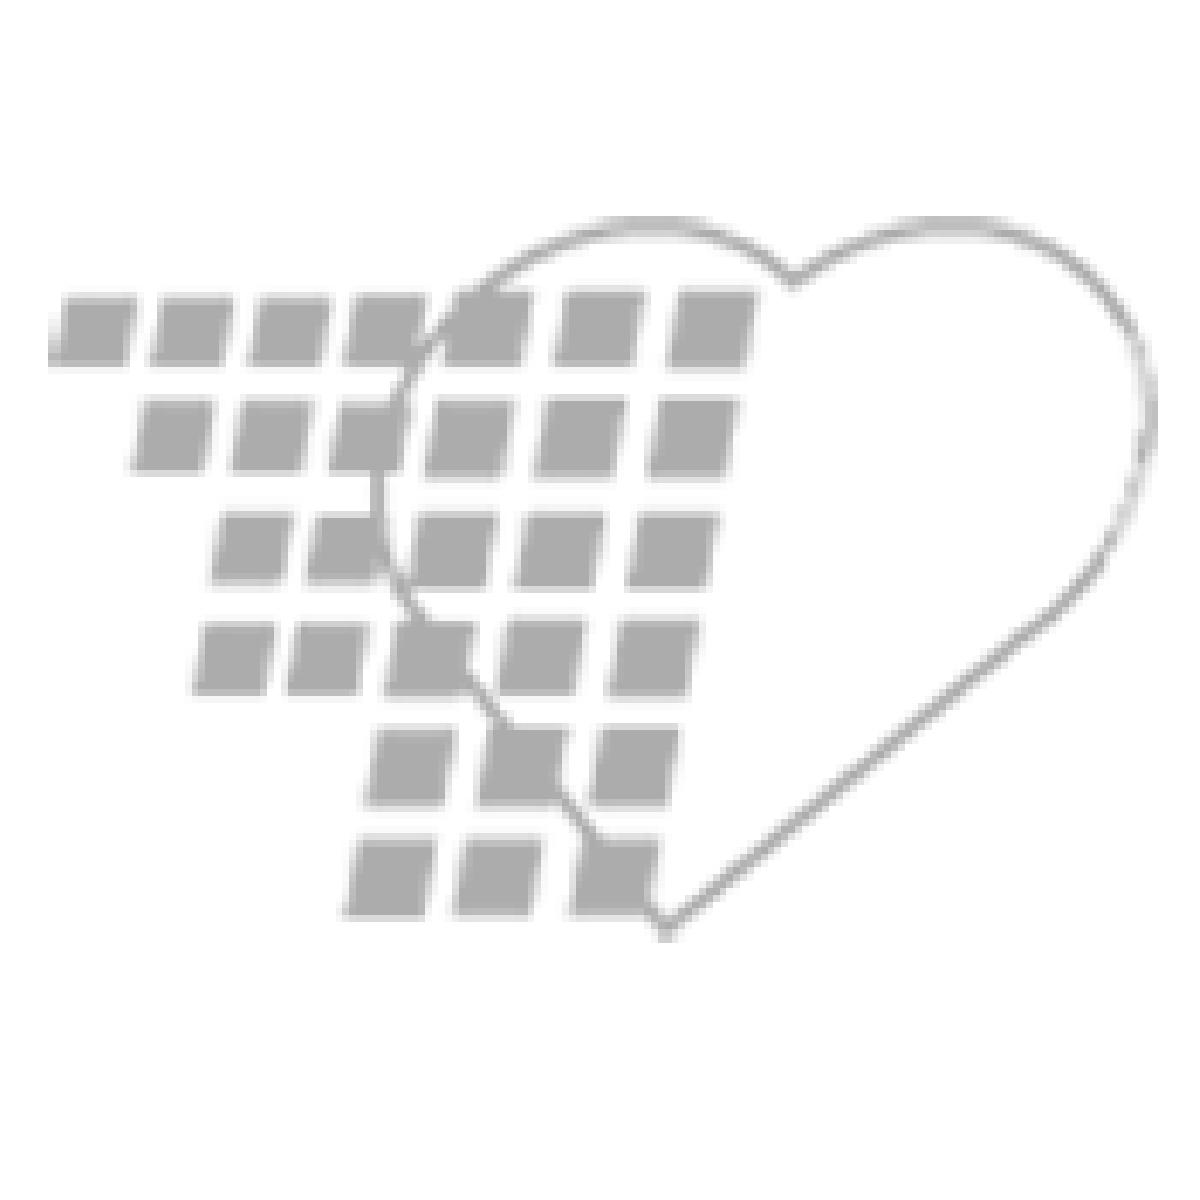 06-93-3124 Demo Dose® Influenza Virus Vaccine (Flulaval) 0.5mL 5mL